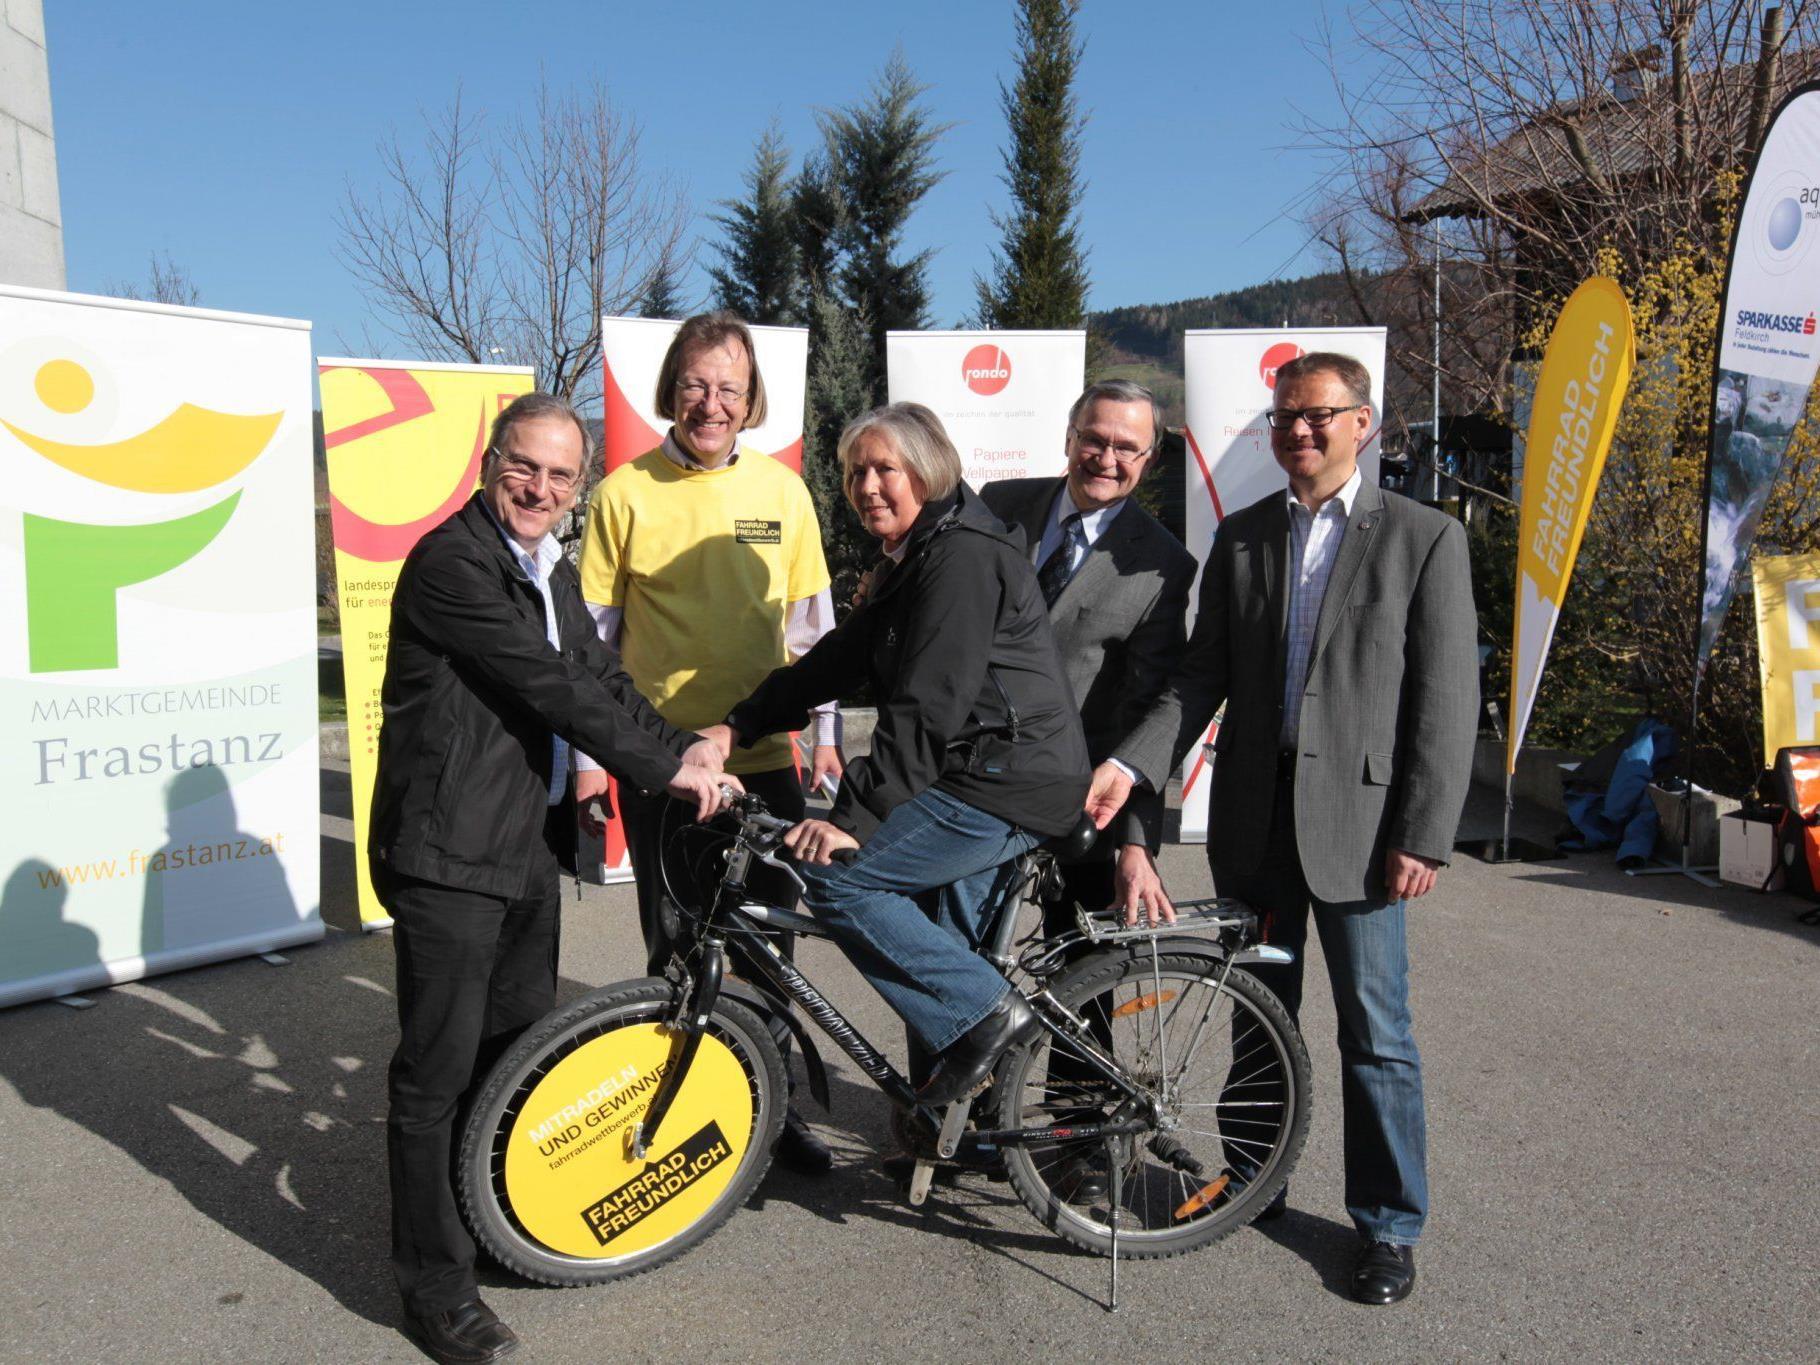 v.l.: Bürgermeister Eugen Gabriel, Mobilitätsmanager Martin Scheuermaier, Peter Steurer (Landesschulrat), Günter Wehinger (Fa. Rondo-Ganahl), Renate Tscbofen (Aqua Mühle)